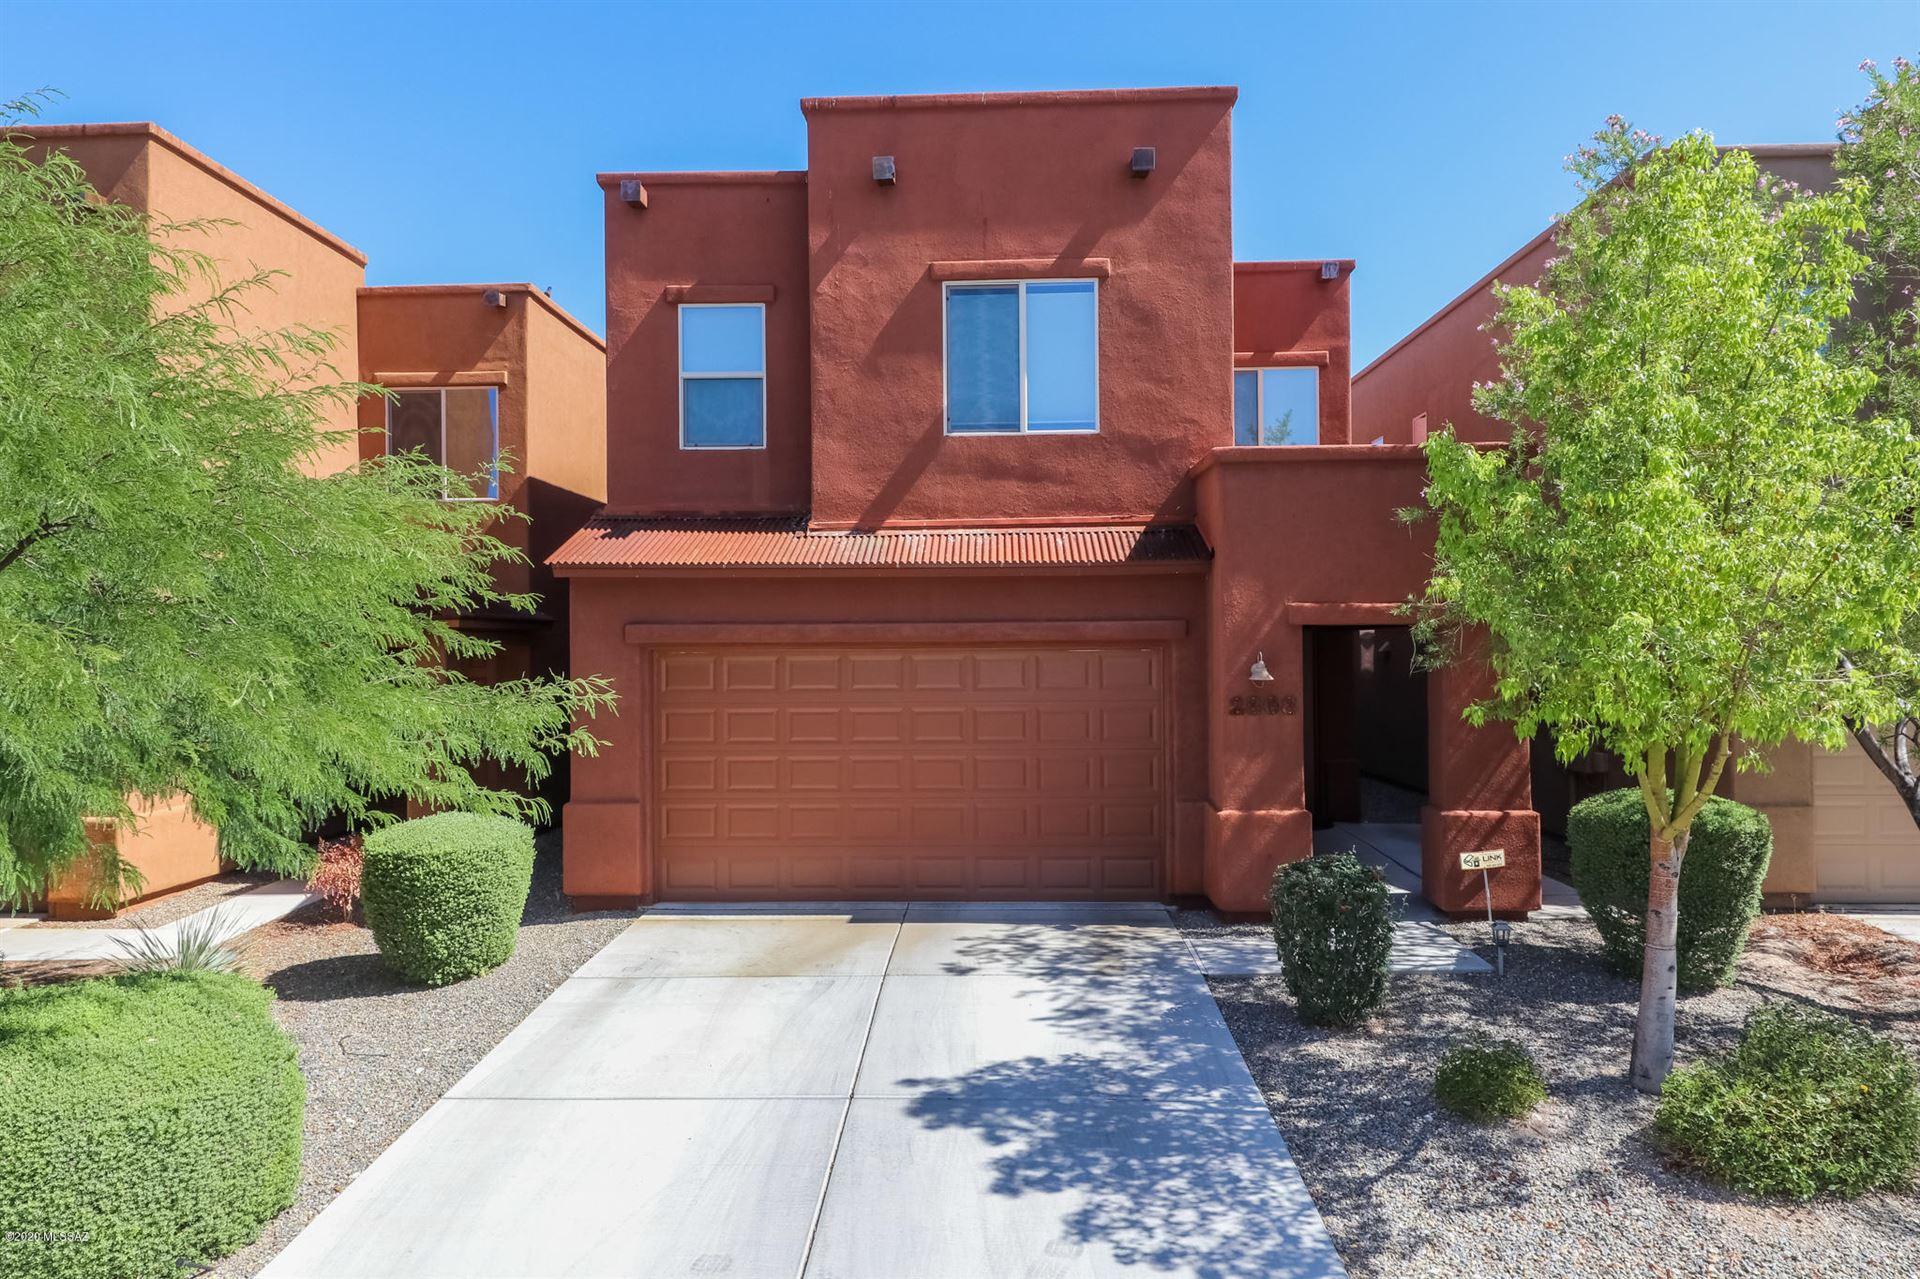 2868 N Silkie Place, Tucson, AZ 85719 - MLS#: 22016183